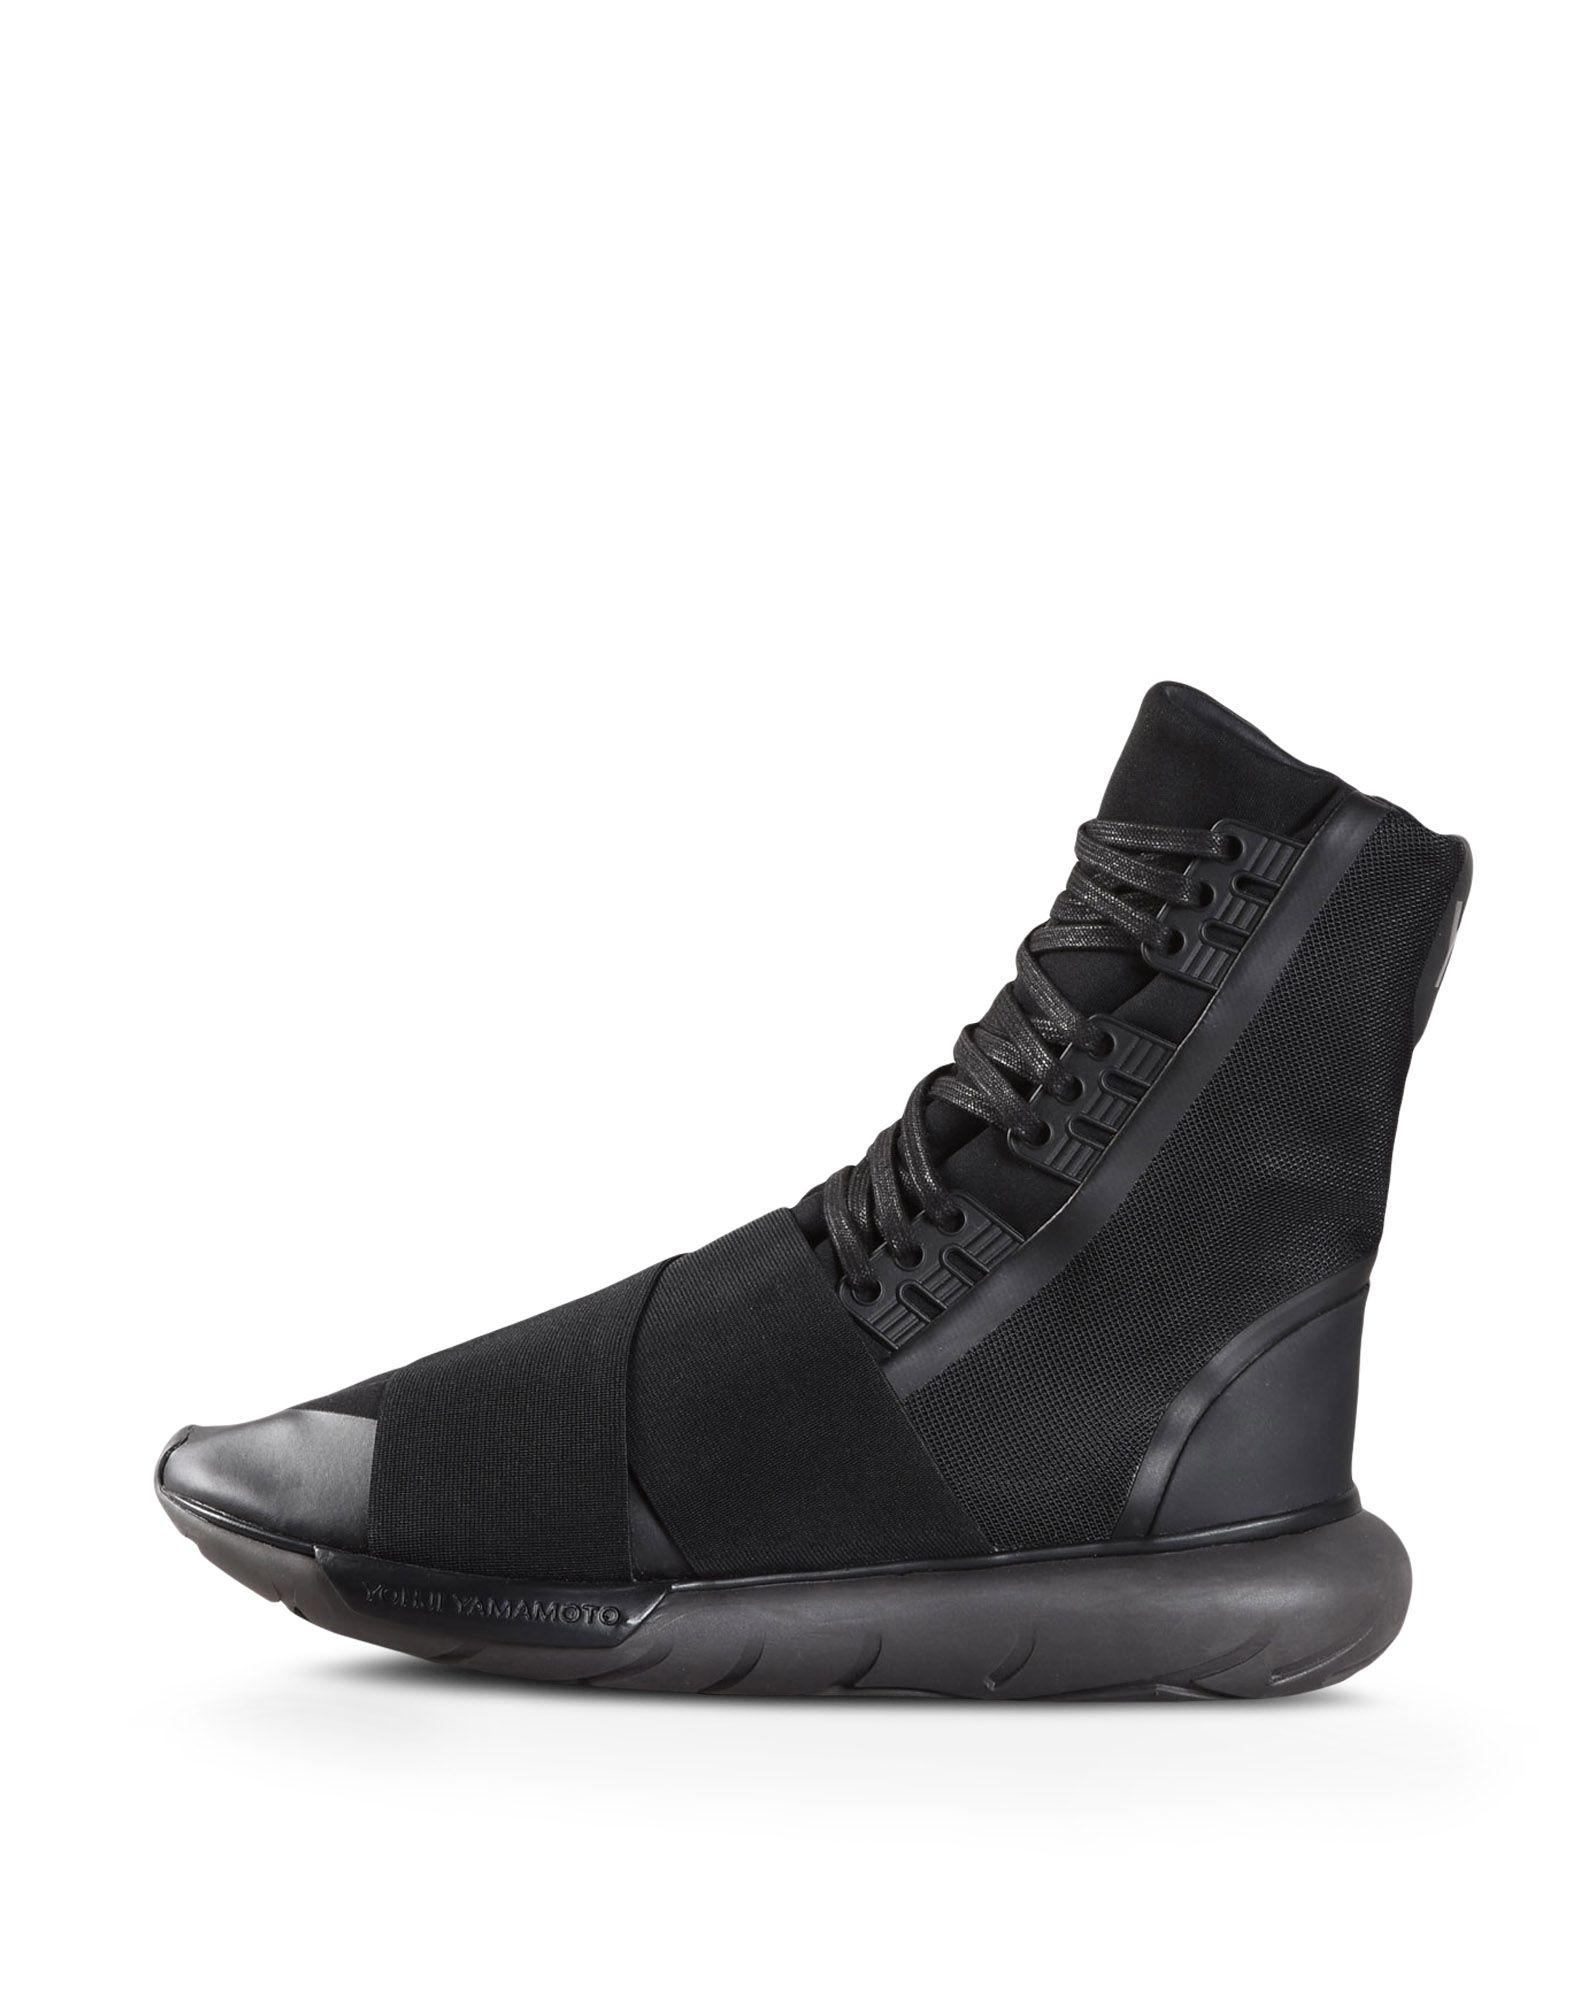 54ee843026e0e ... Y-3 Y-3 QASA BOOT High-top sneakers Man f ...